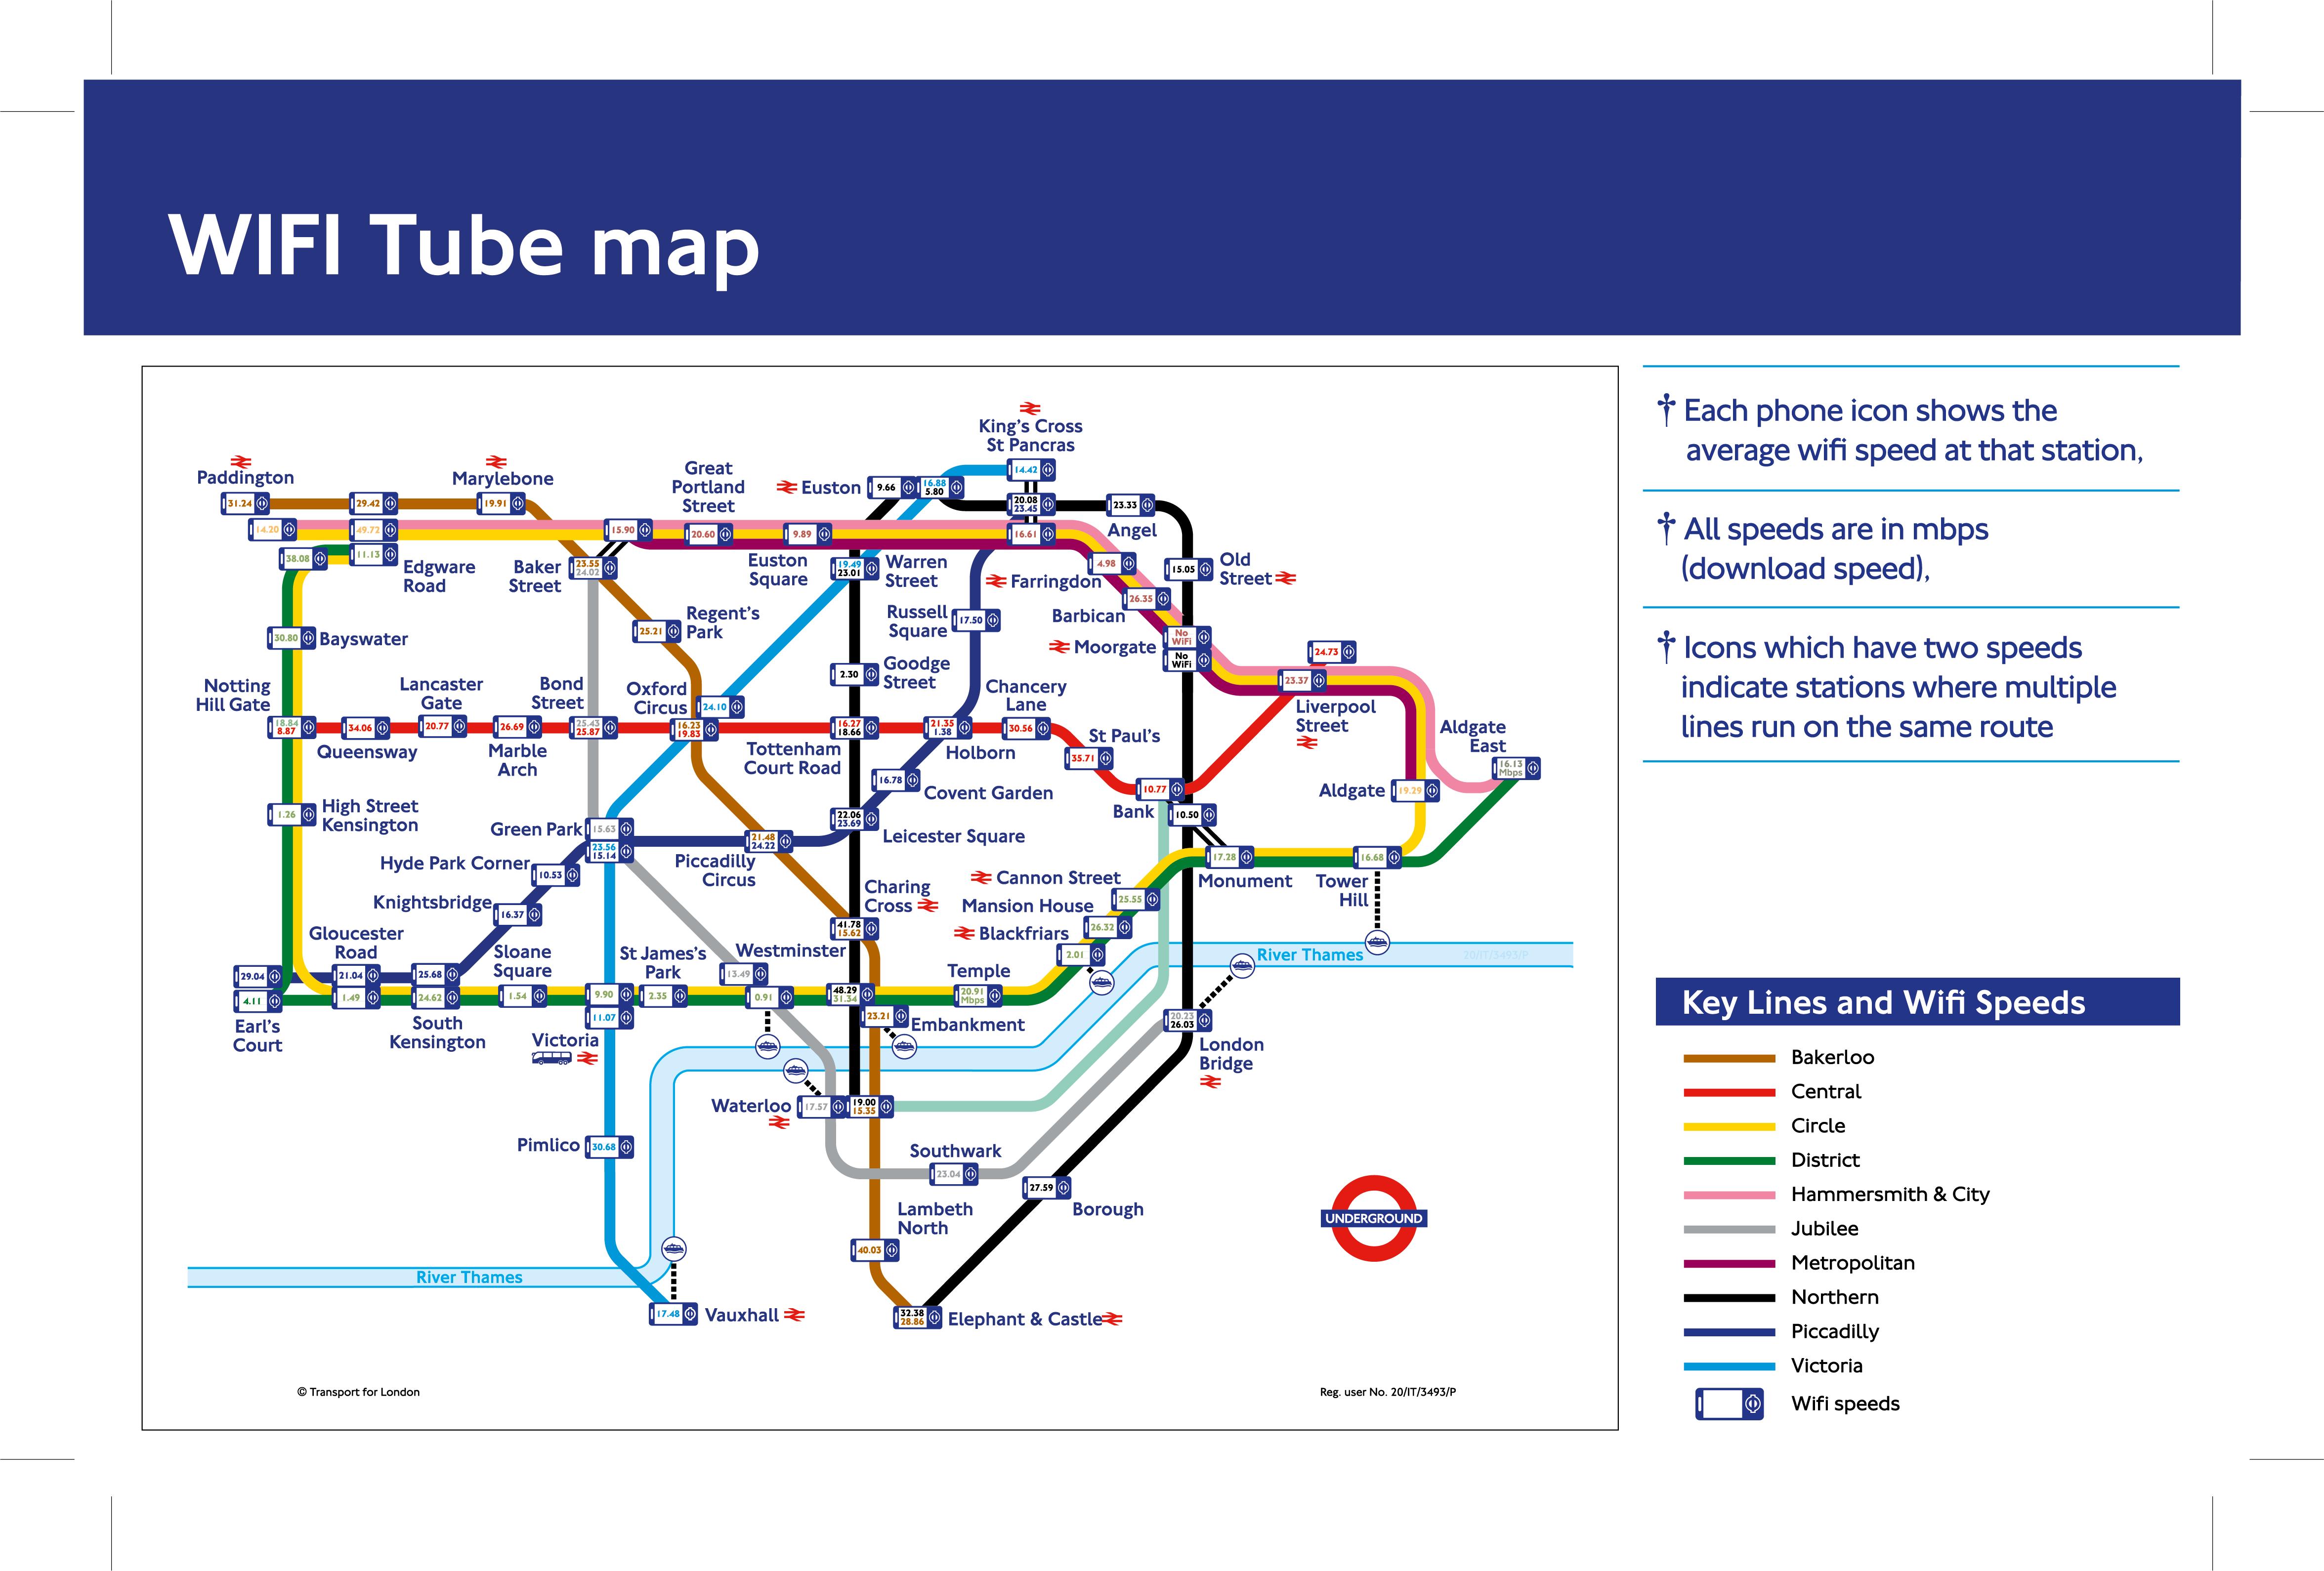 Full size Wi-Fi tube map